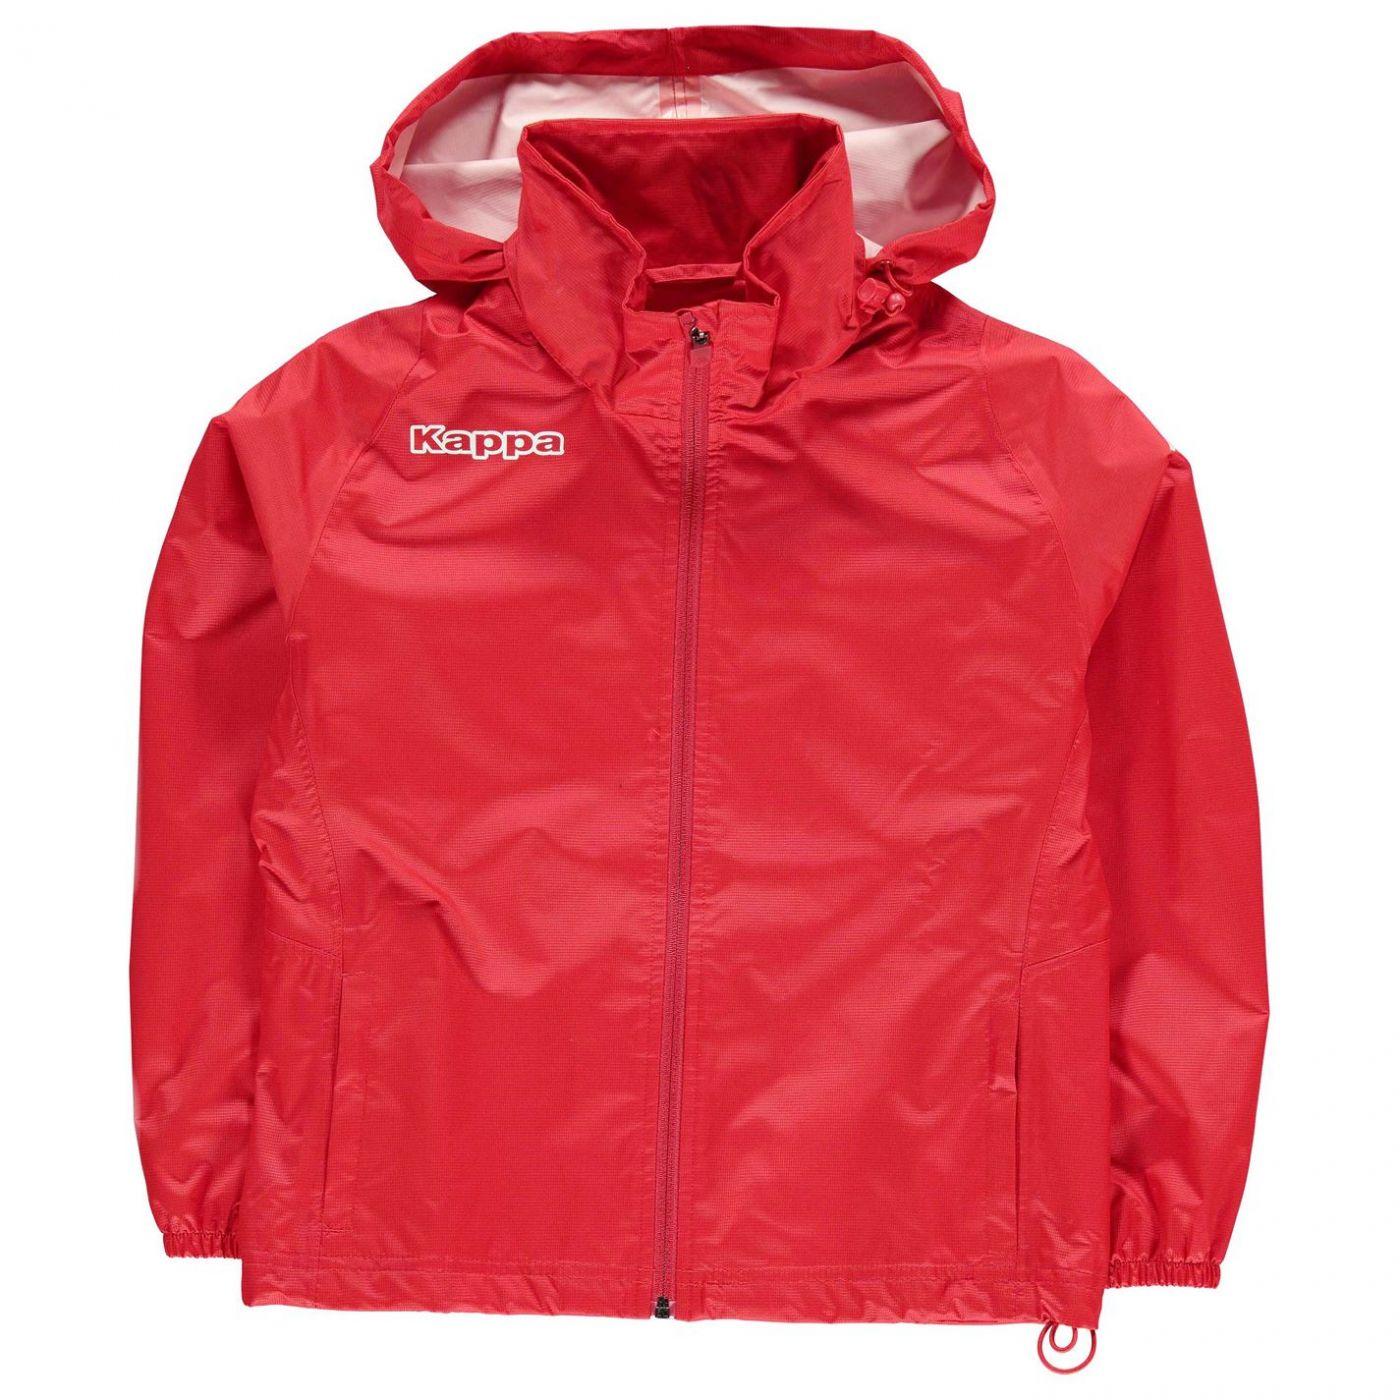 Kappa Train Rain Jacket Junior Boys